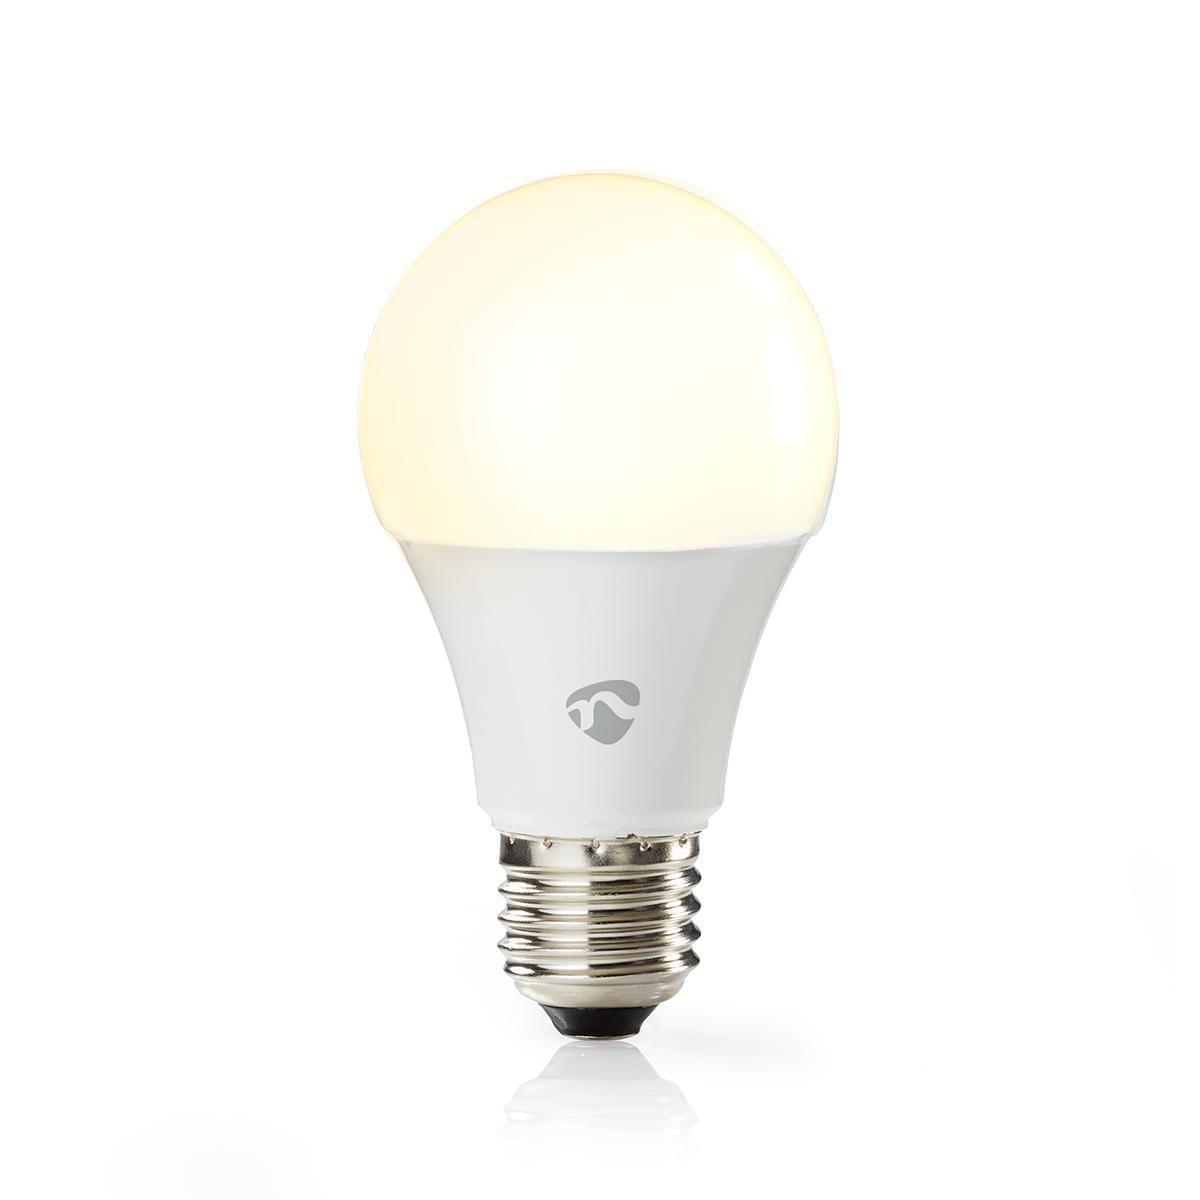 Lampada Wi-Fi Smart 6W LED Nedis RGB + luce calda